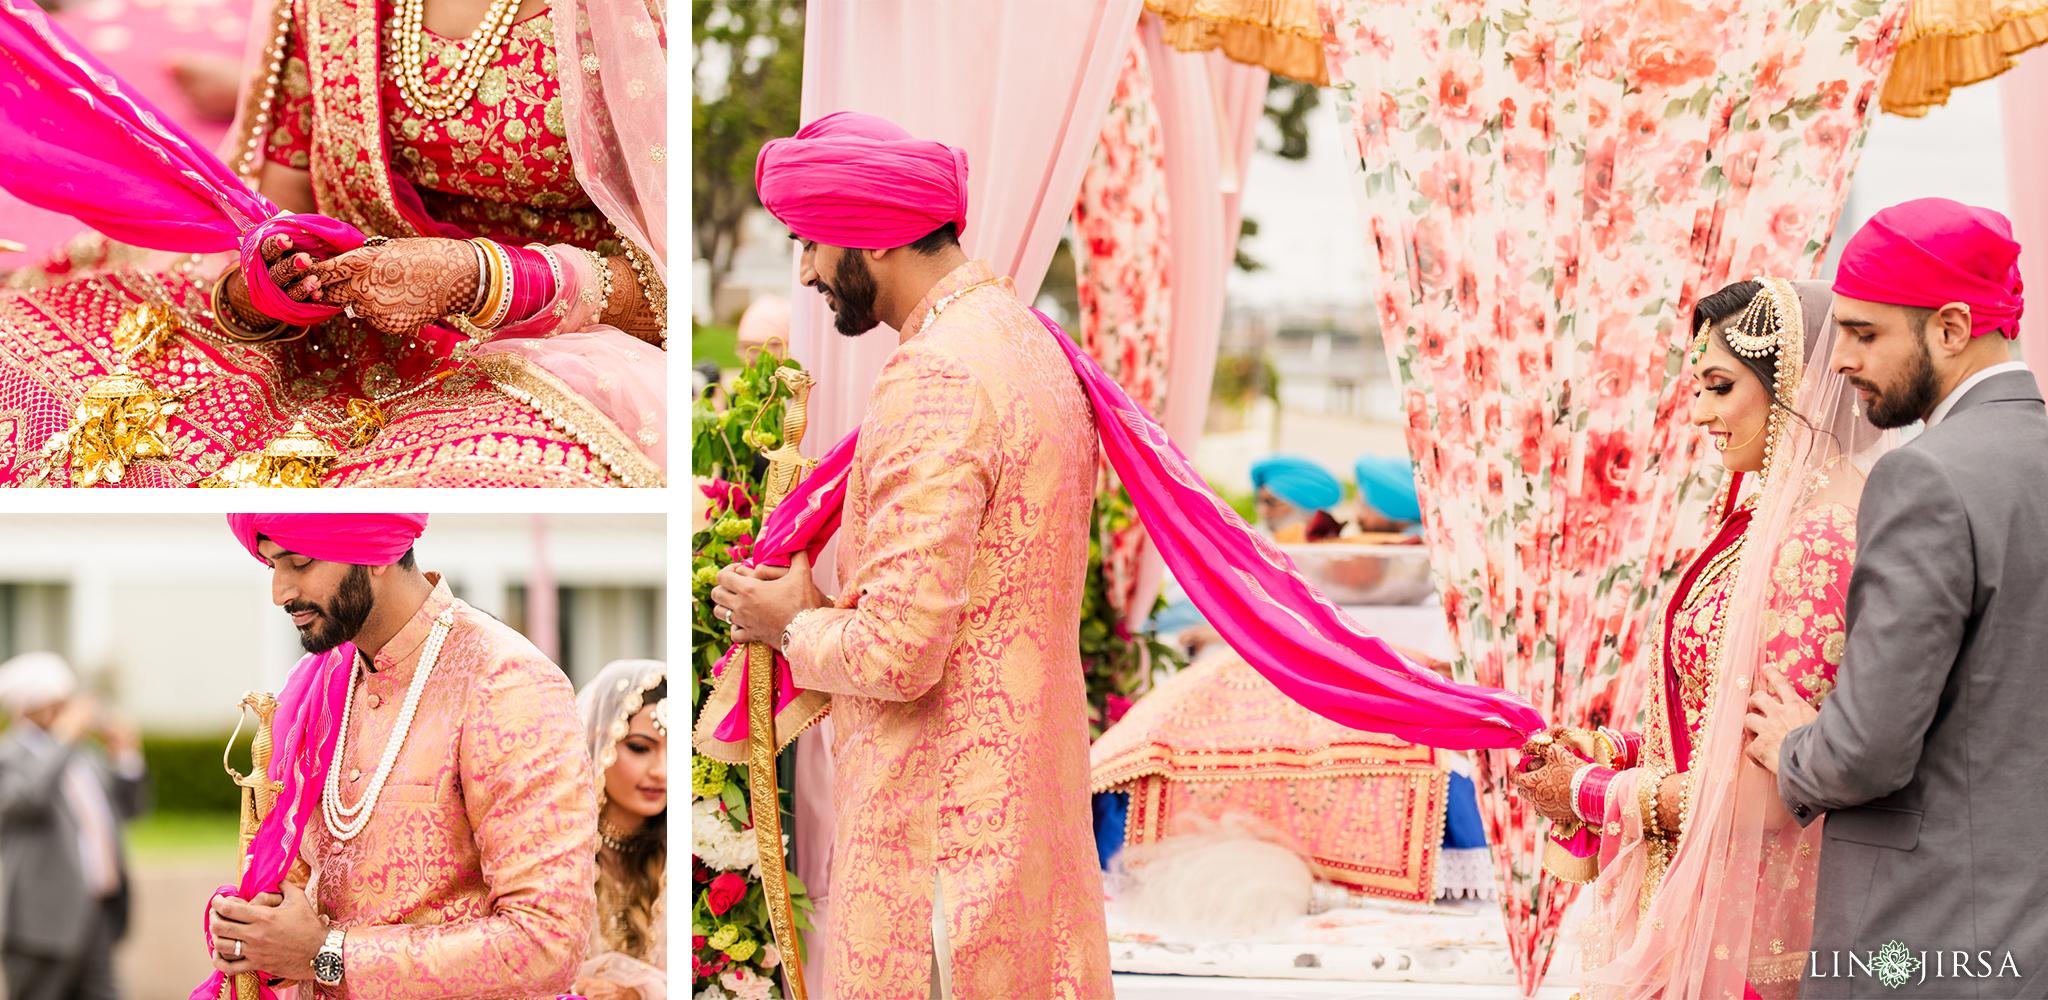 19 Coronado Resort and Spa San Diego Punjabi Wedding Photography